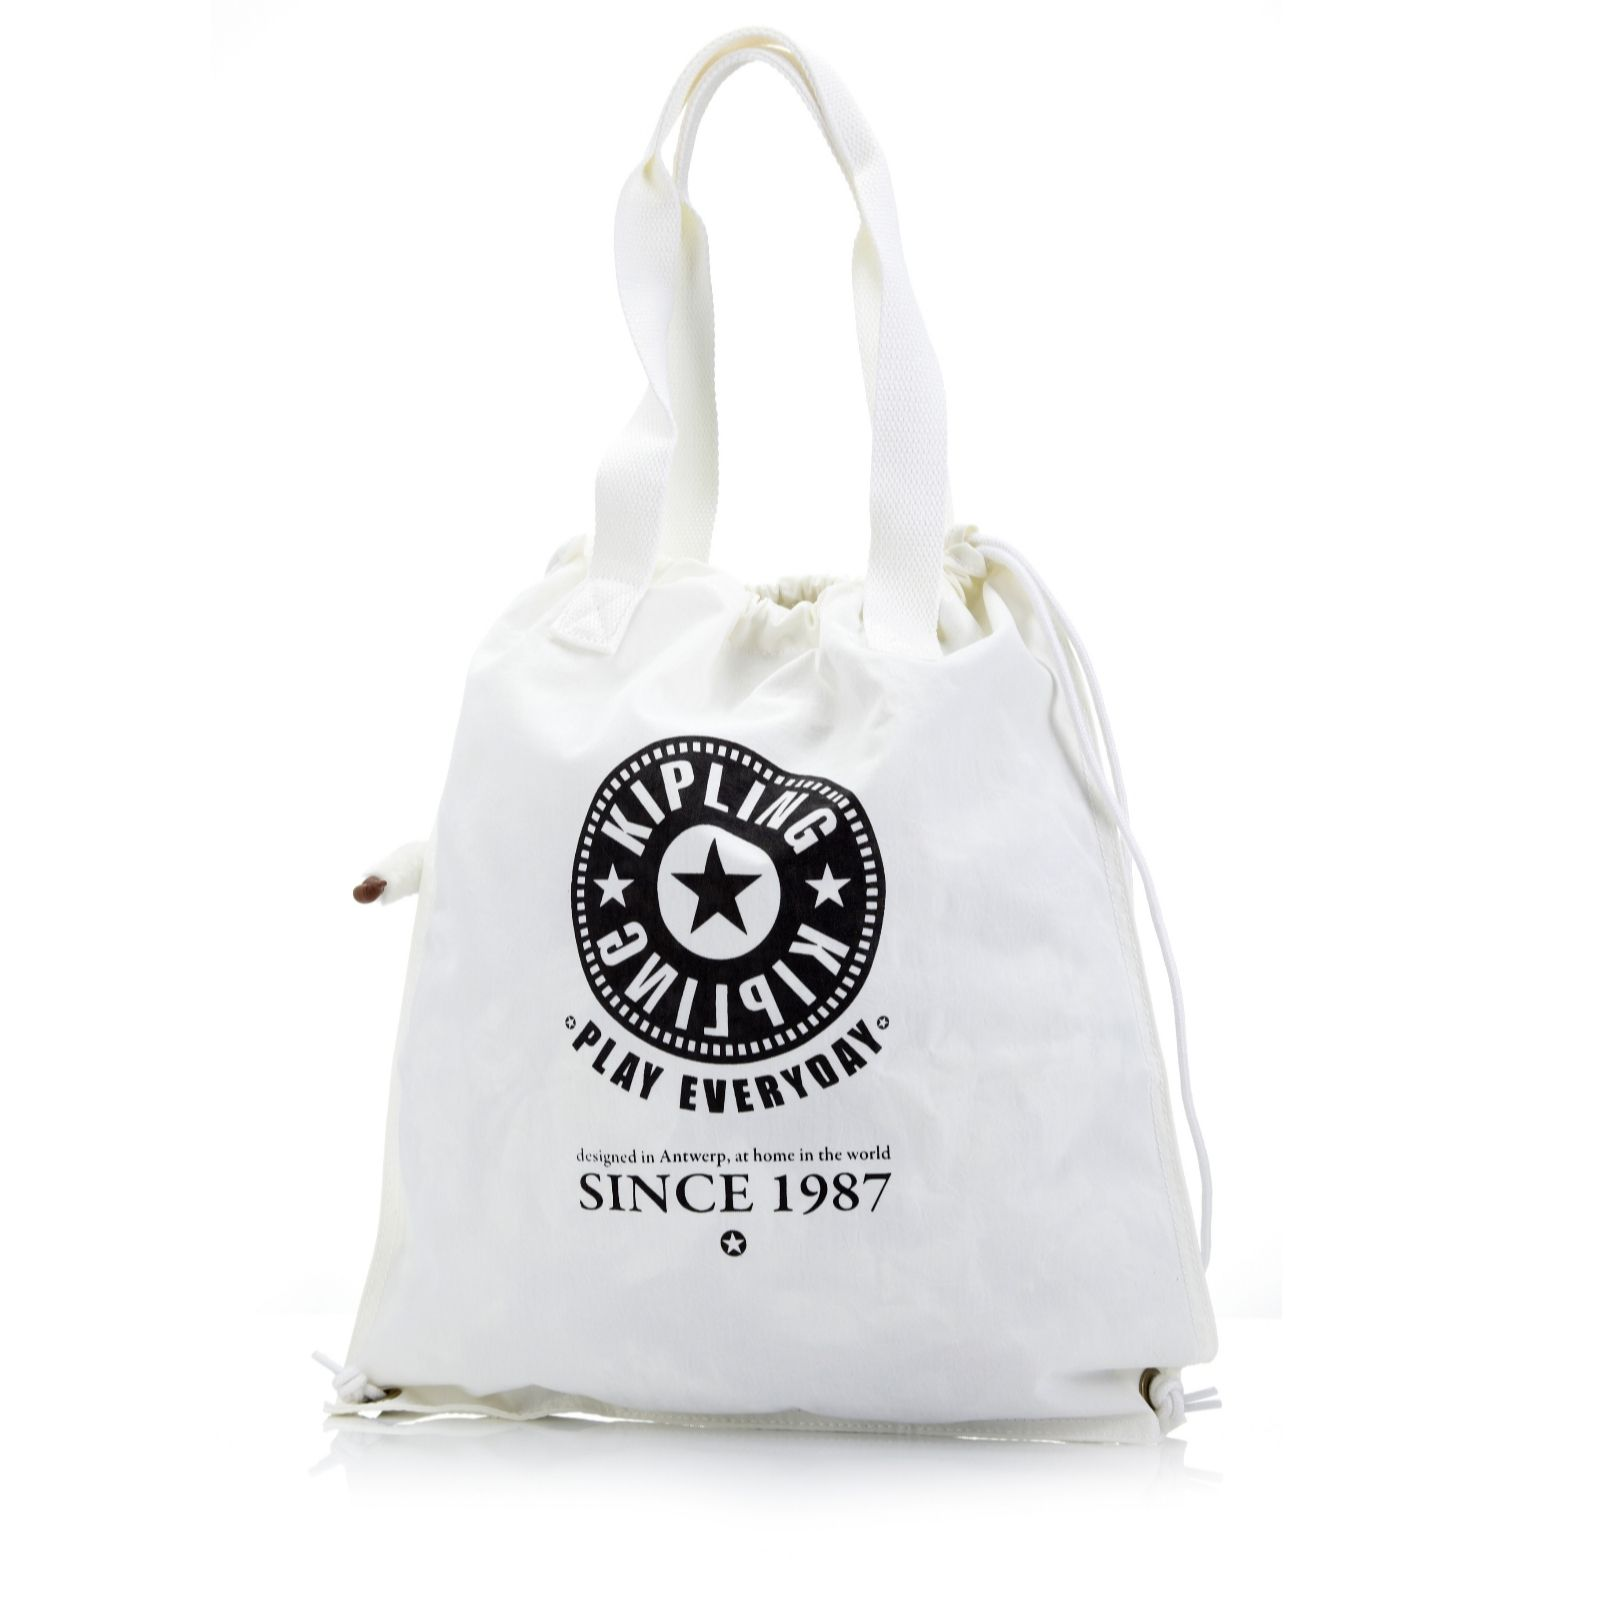 967fd26164 Kipling Hip Hurray Drawstring Bag - Page 1 - QVC UK